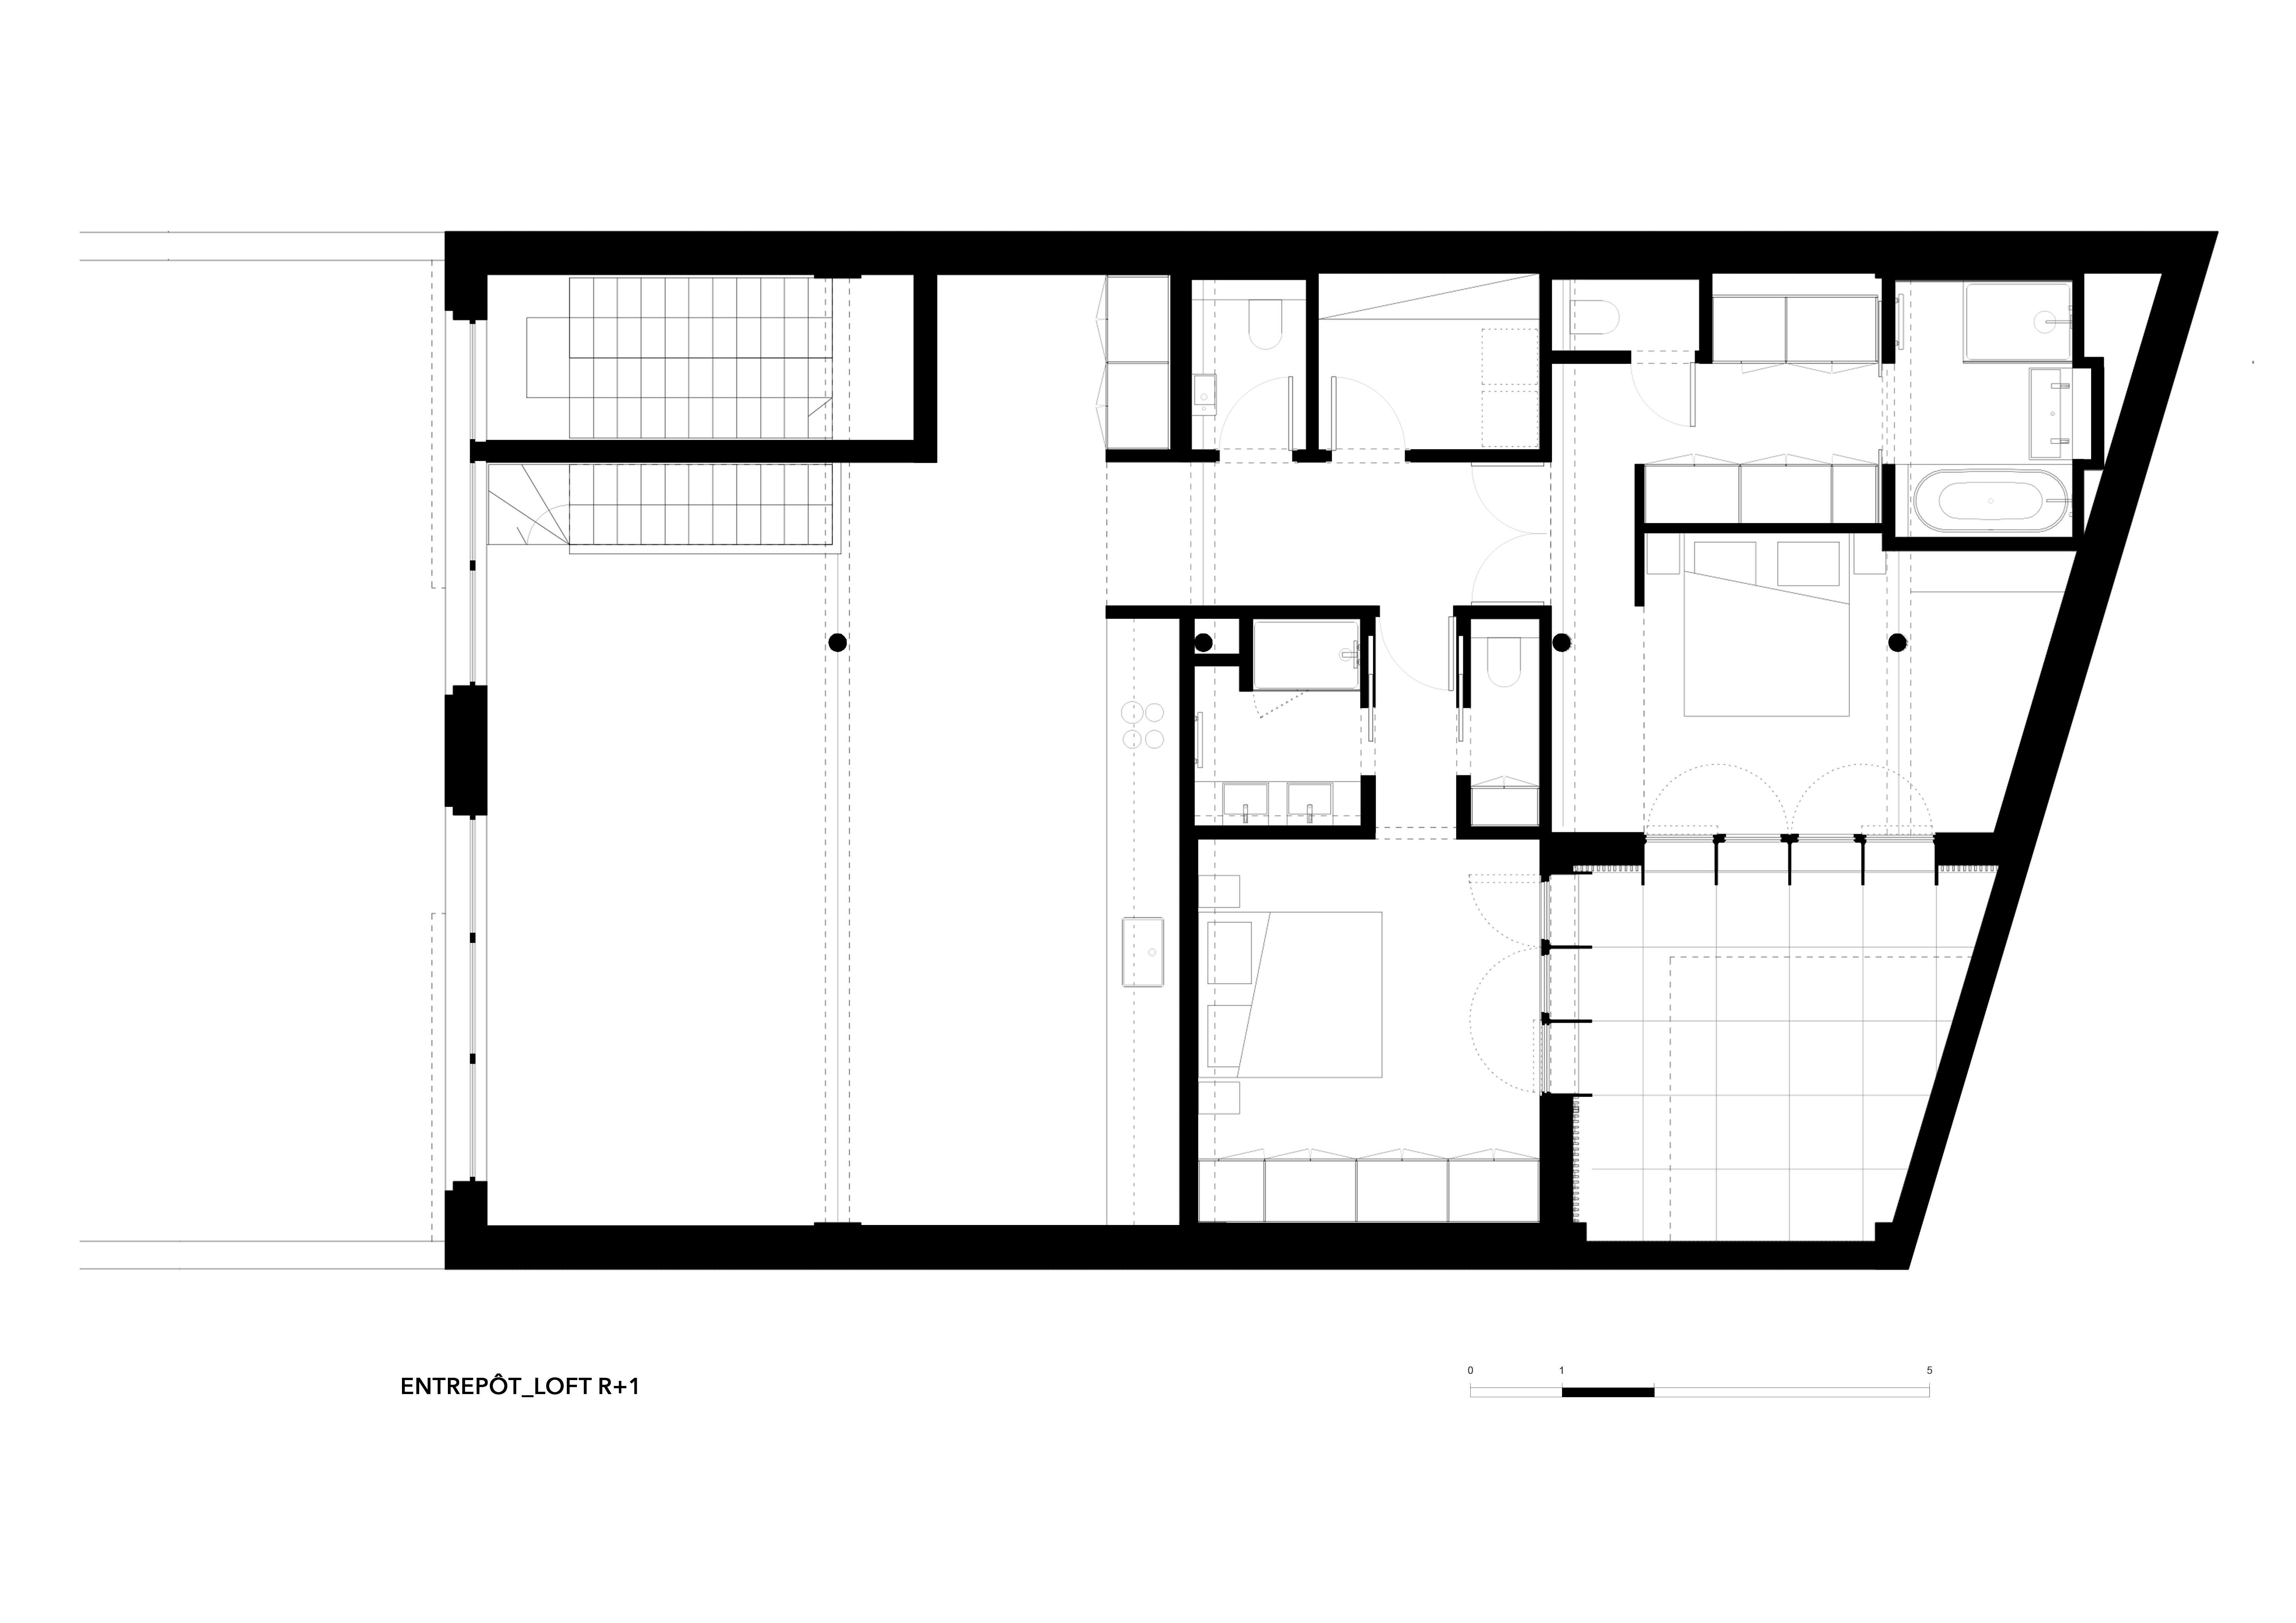 AVW_Intendant_Plan-Entrepôt-R+1